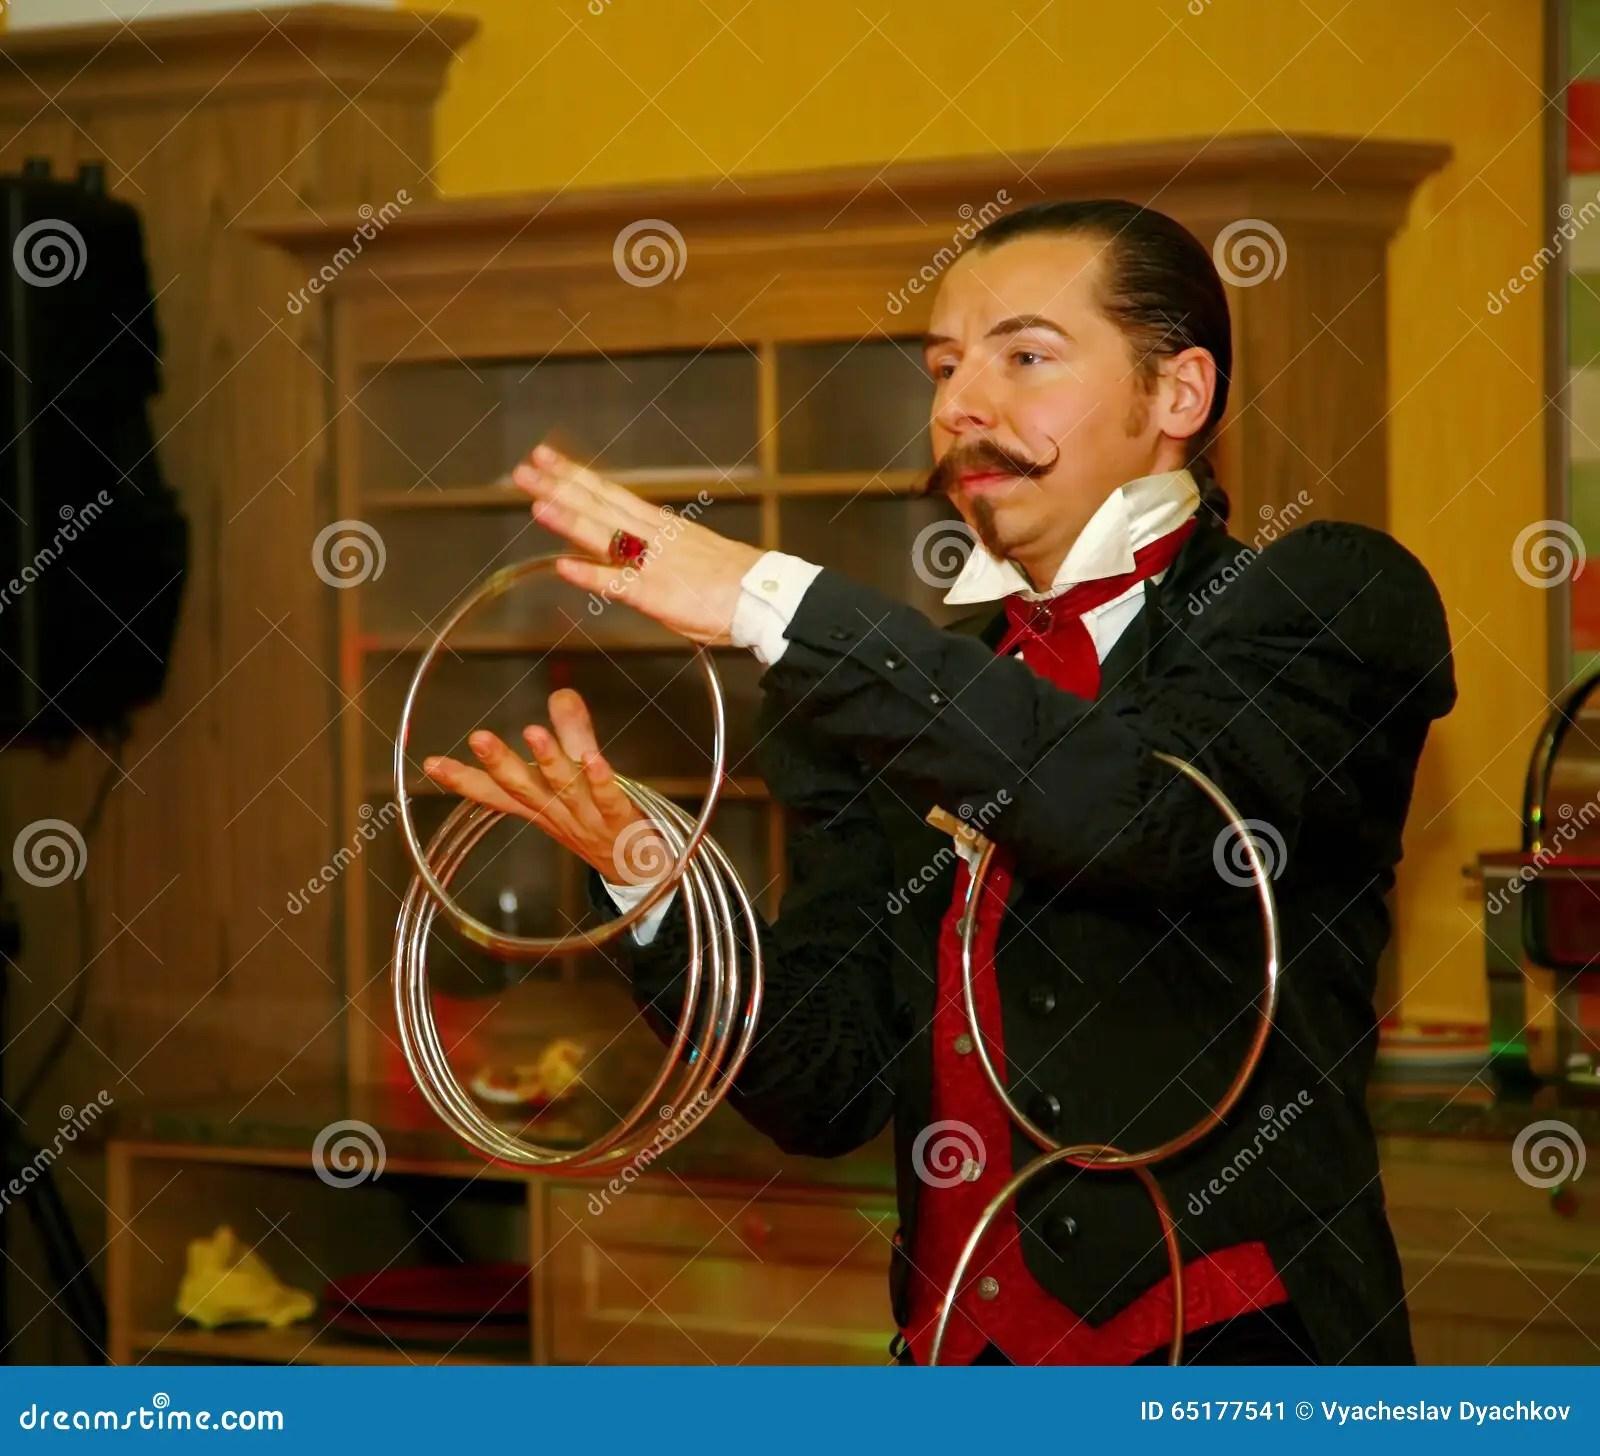 kitchen magician modern undermount sink 使用与火 由演员的表现魔术师魔术师罗马罗宋汤编辑类照片 图片包括有 一个美丽和轰烈的富人场面餐馆室内设计旅馆朱鹭 圣彼德堡 俄罗斯的家厨房由魔术师的表现罗马罗宋汤